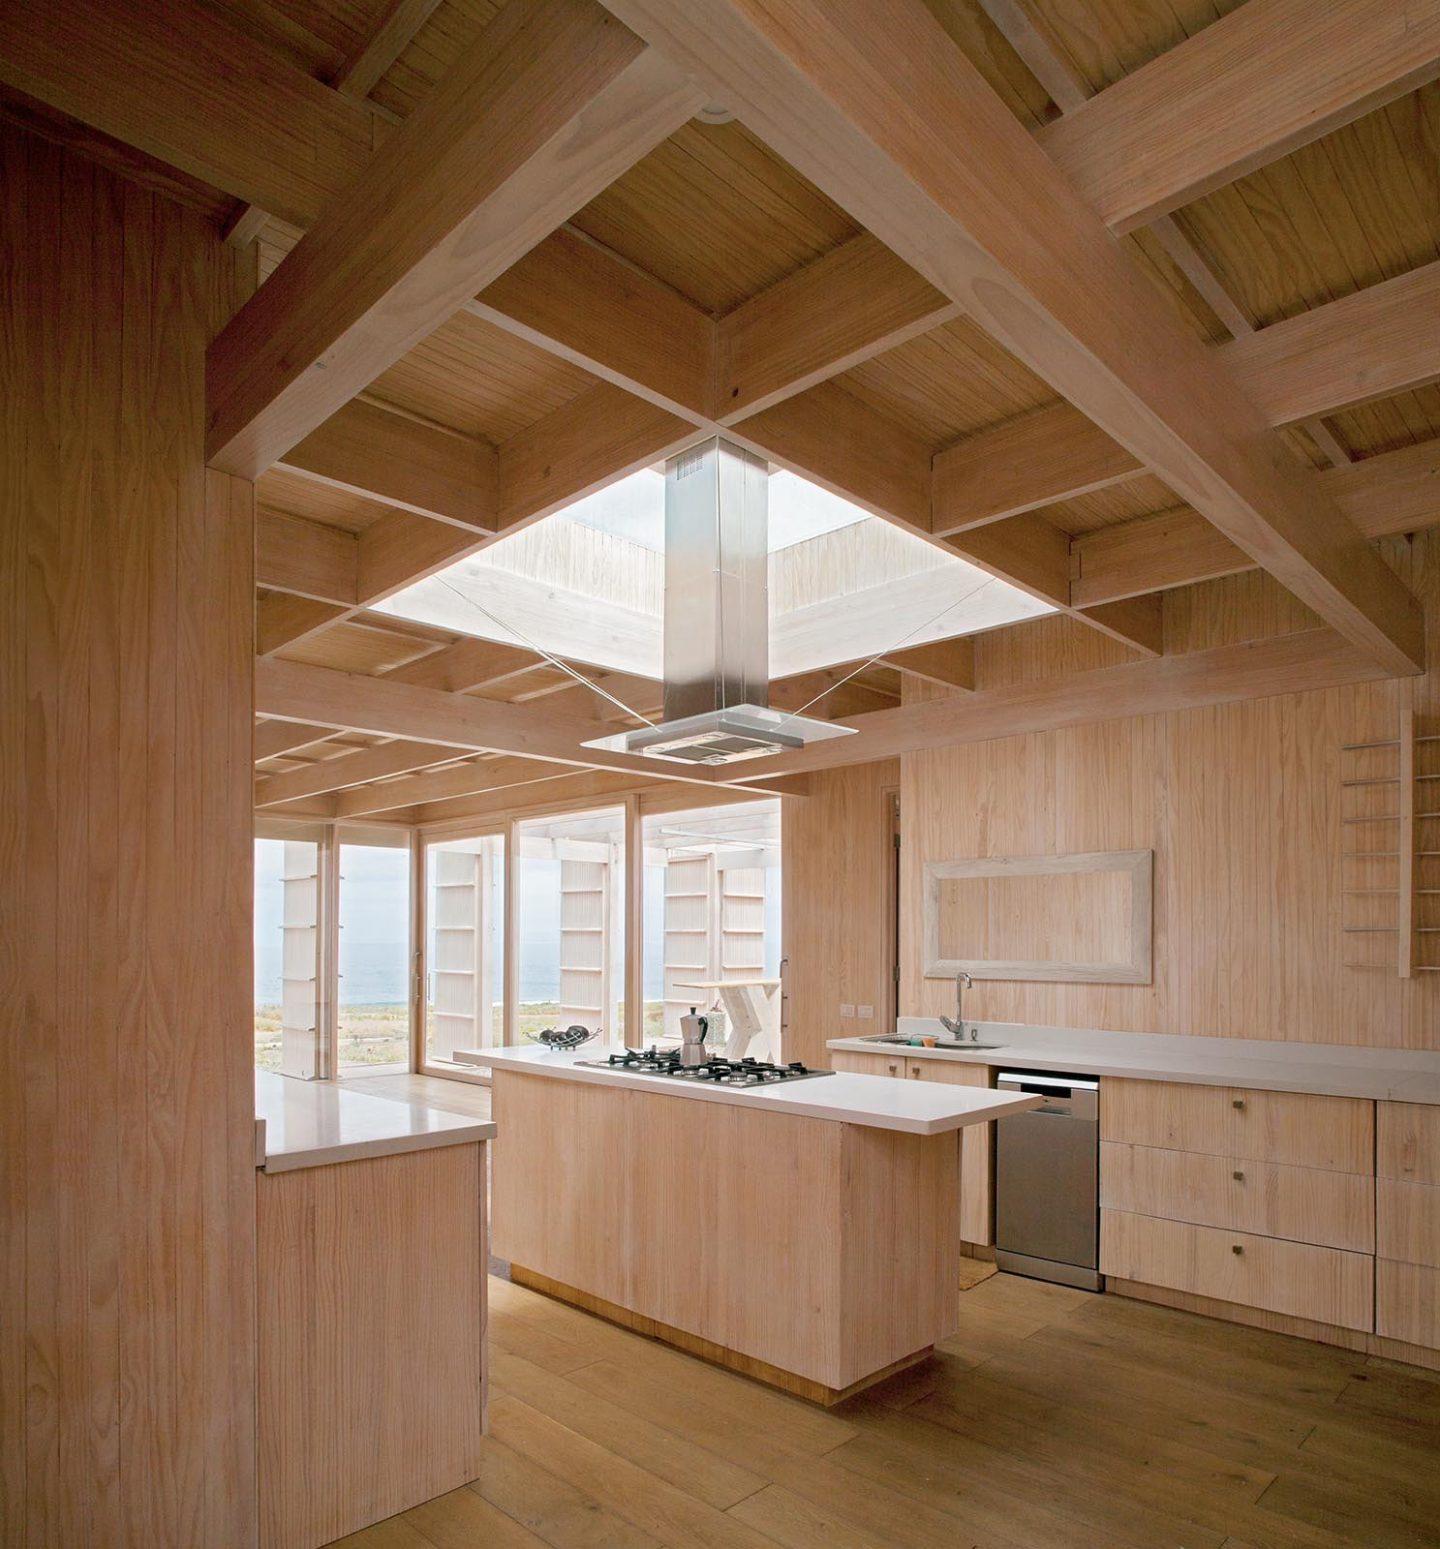 Architecture_Cristian_Izquierdo_Casa_En_Morillos_10